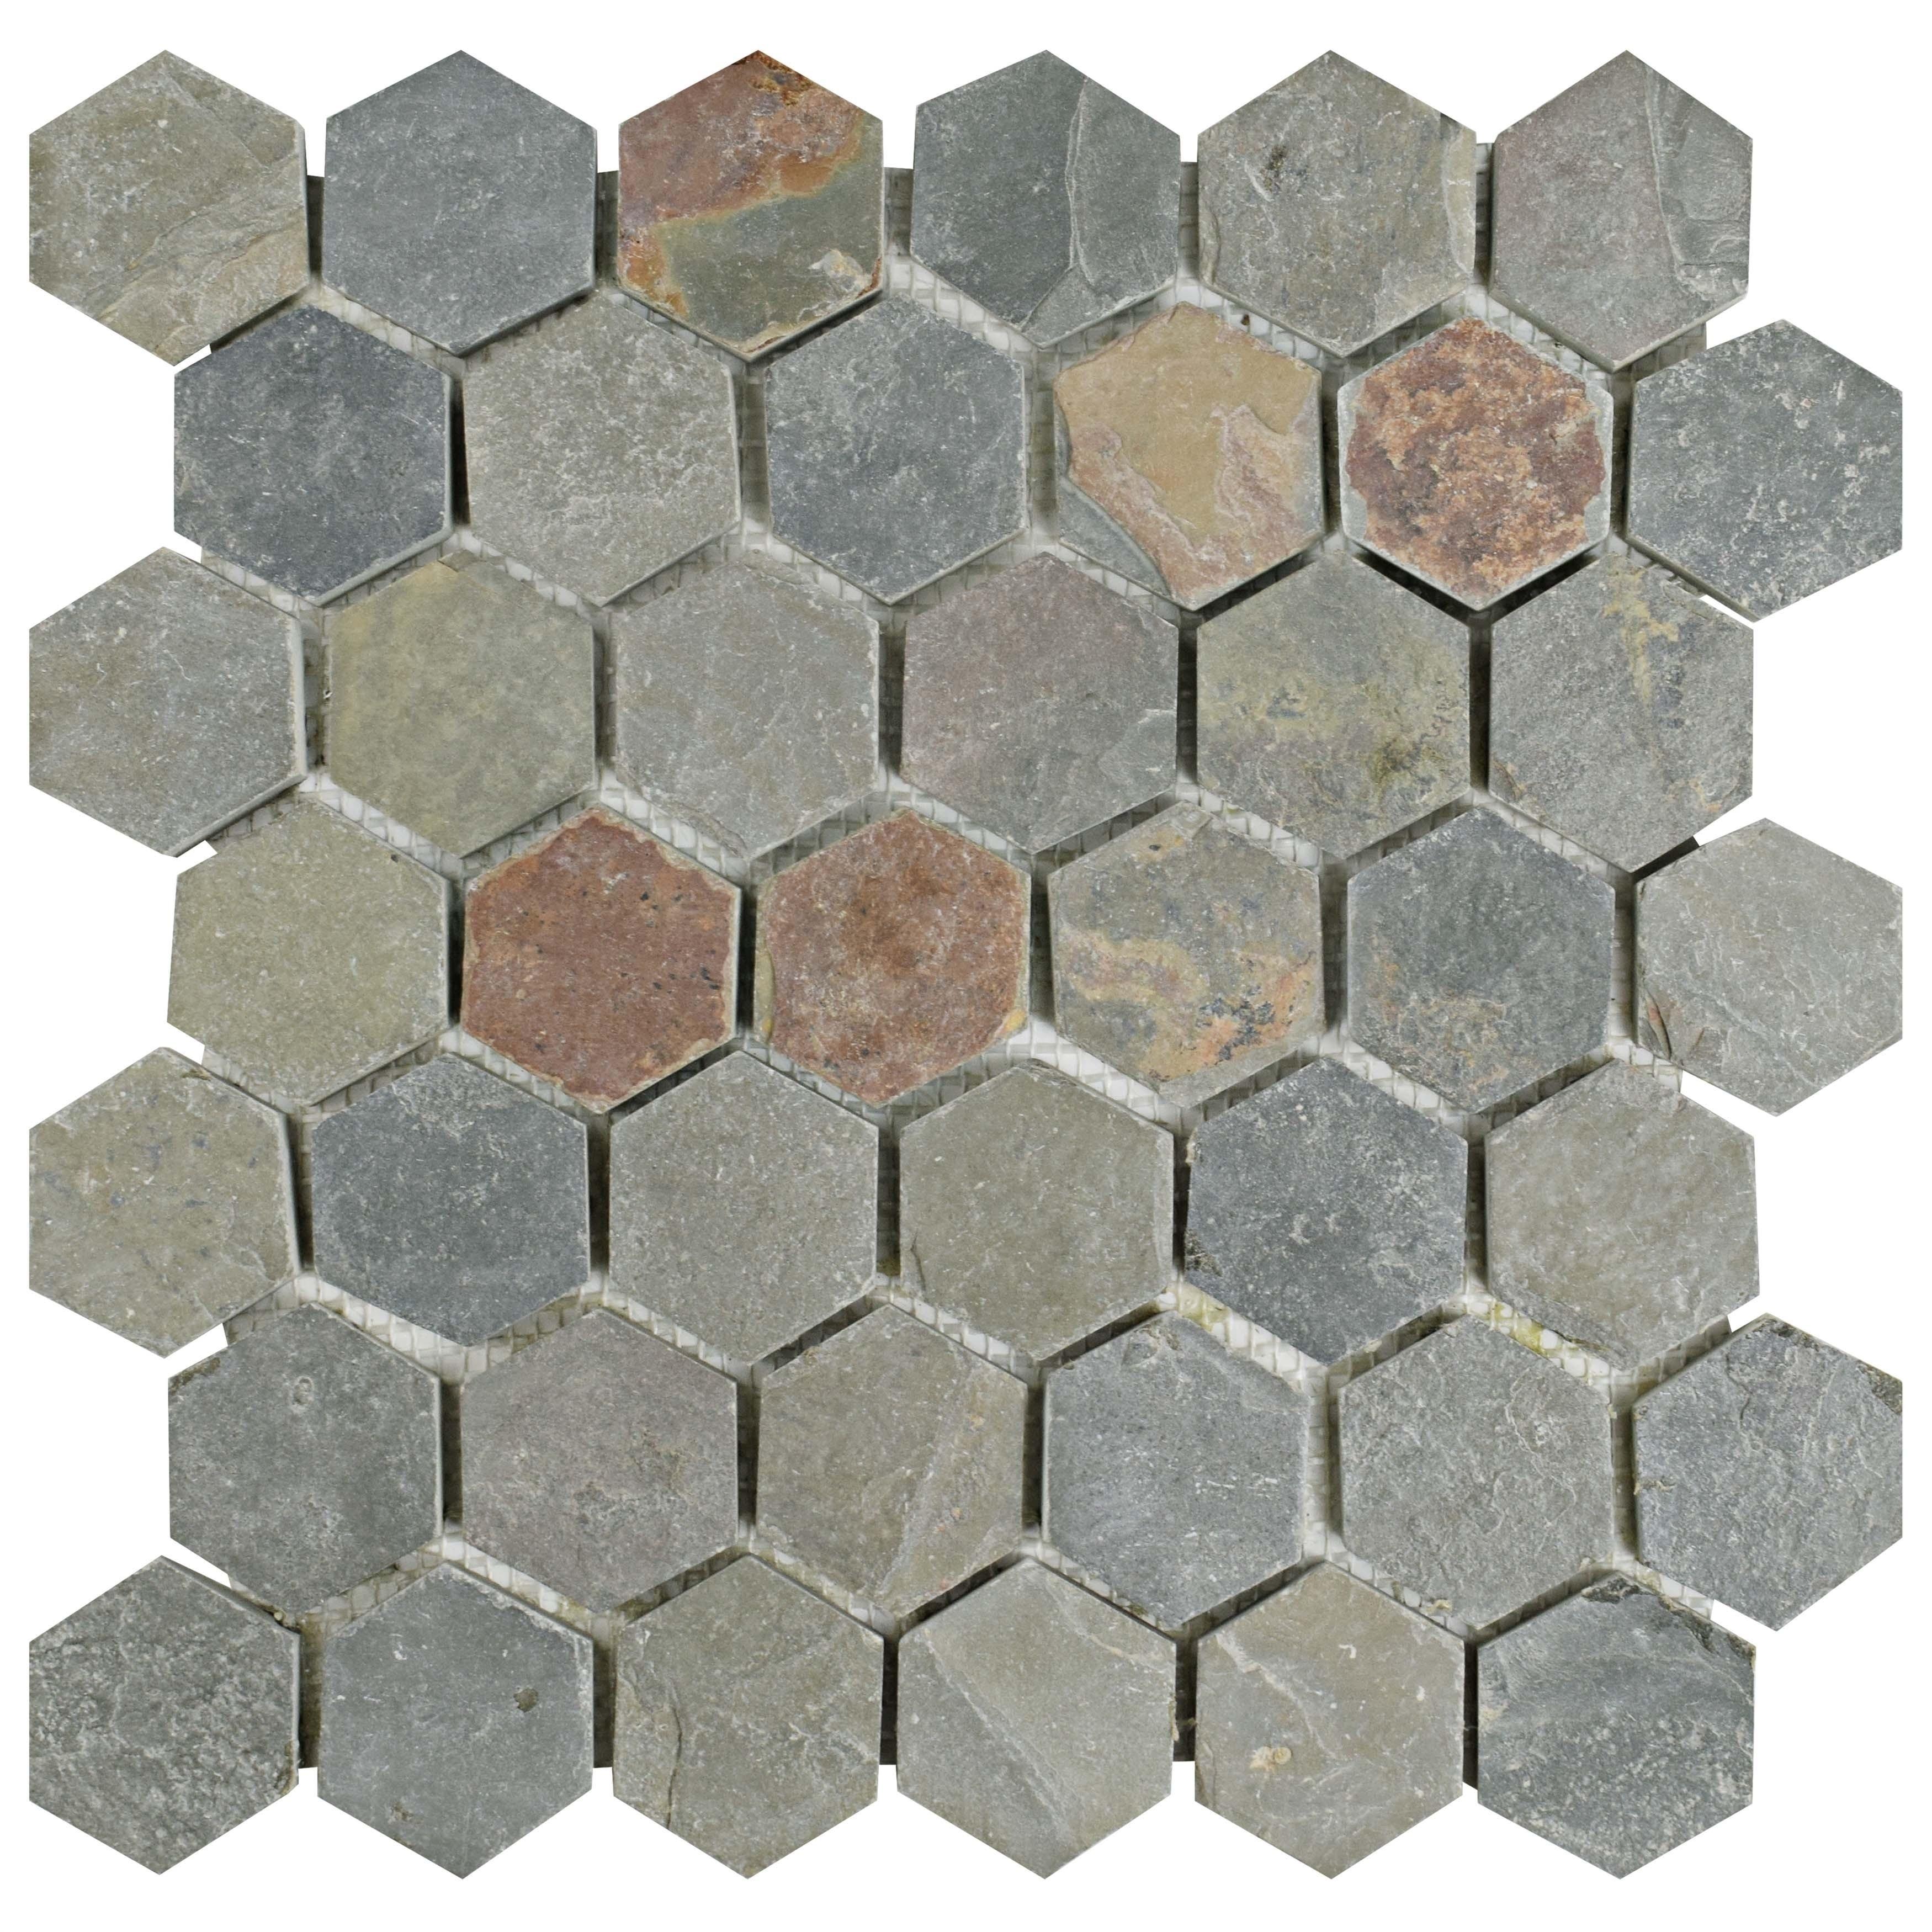 Somertile 12x12-inch Ridge Hexagon Multi Slate Natural Stone Floor and Wall Tile (Case of 10) (Ridge Hexagon Multi Slate), Grey, Size 12 x 12